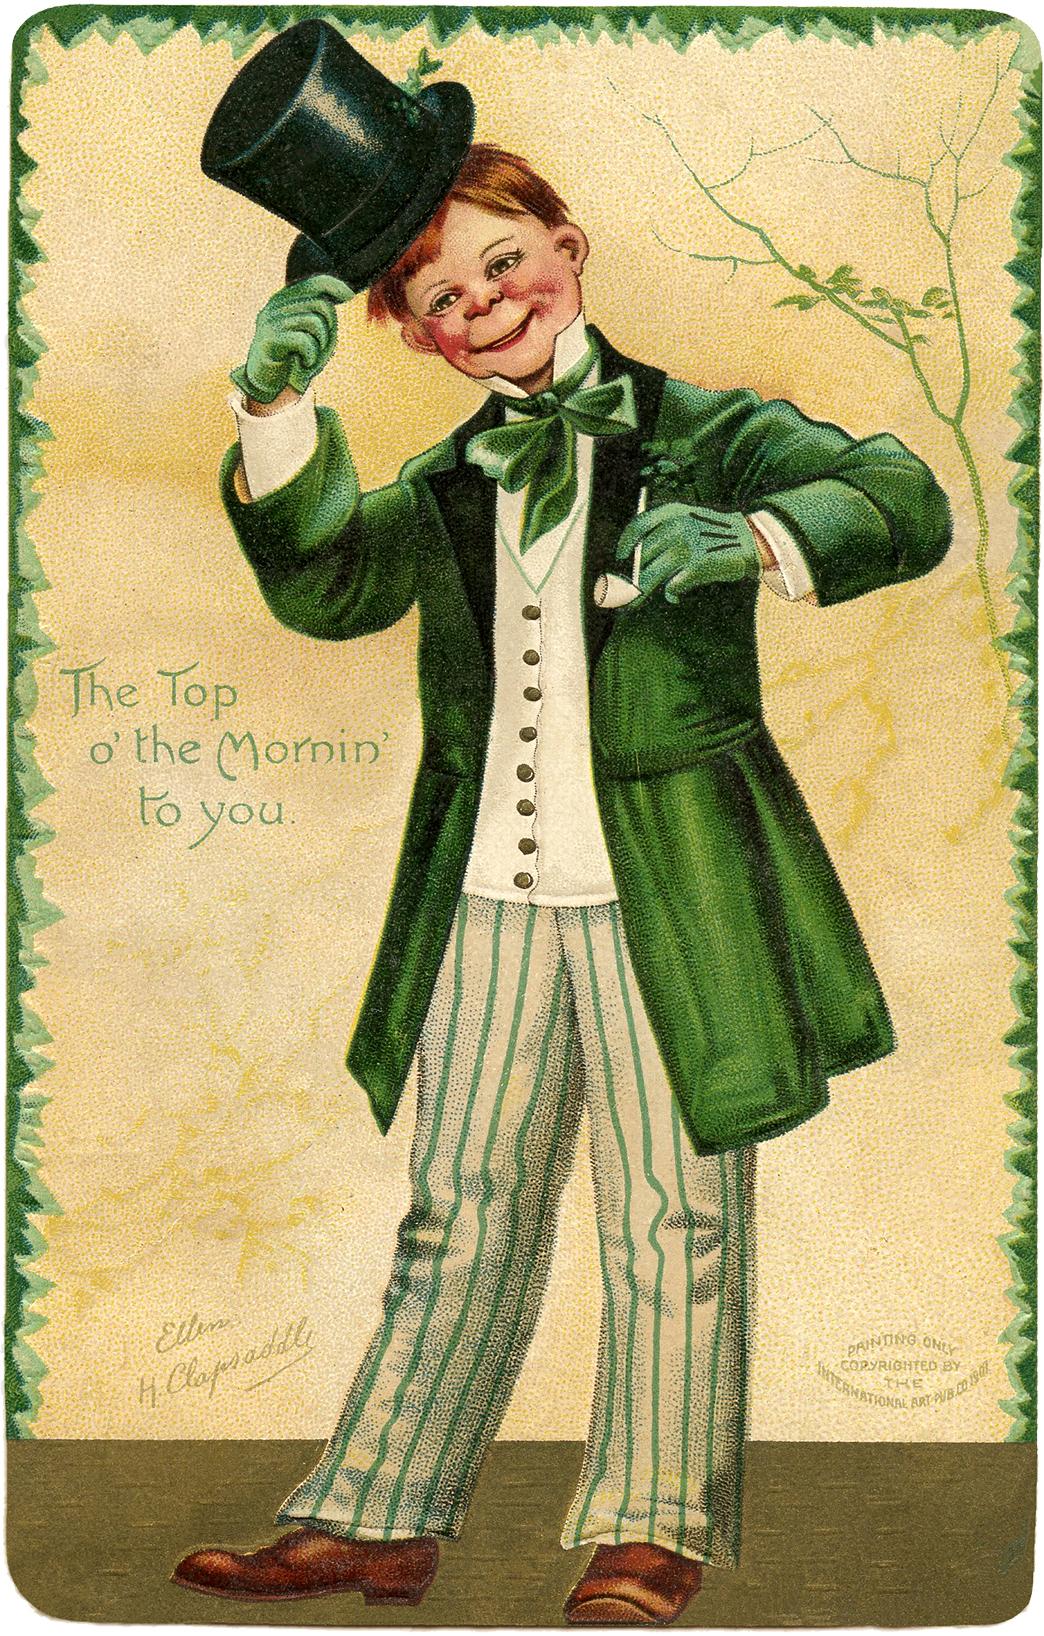 Vintage Redhead Irishman Image The Graphics Fairy